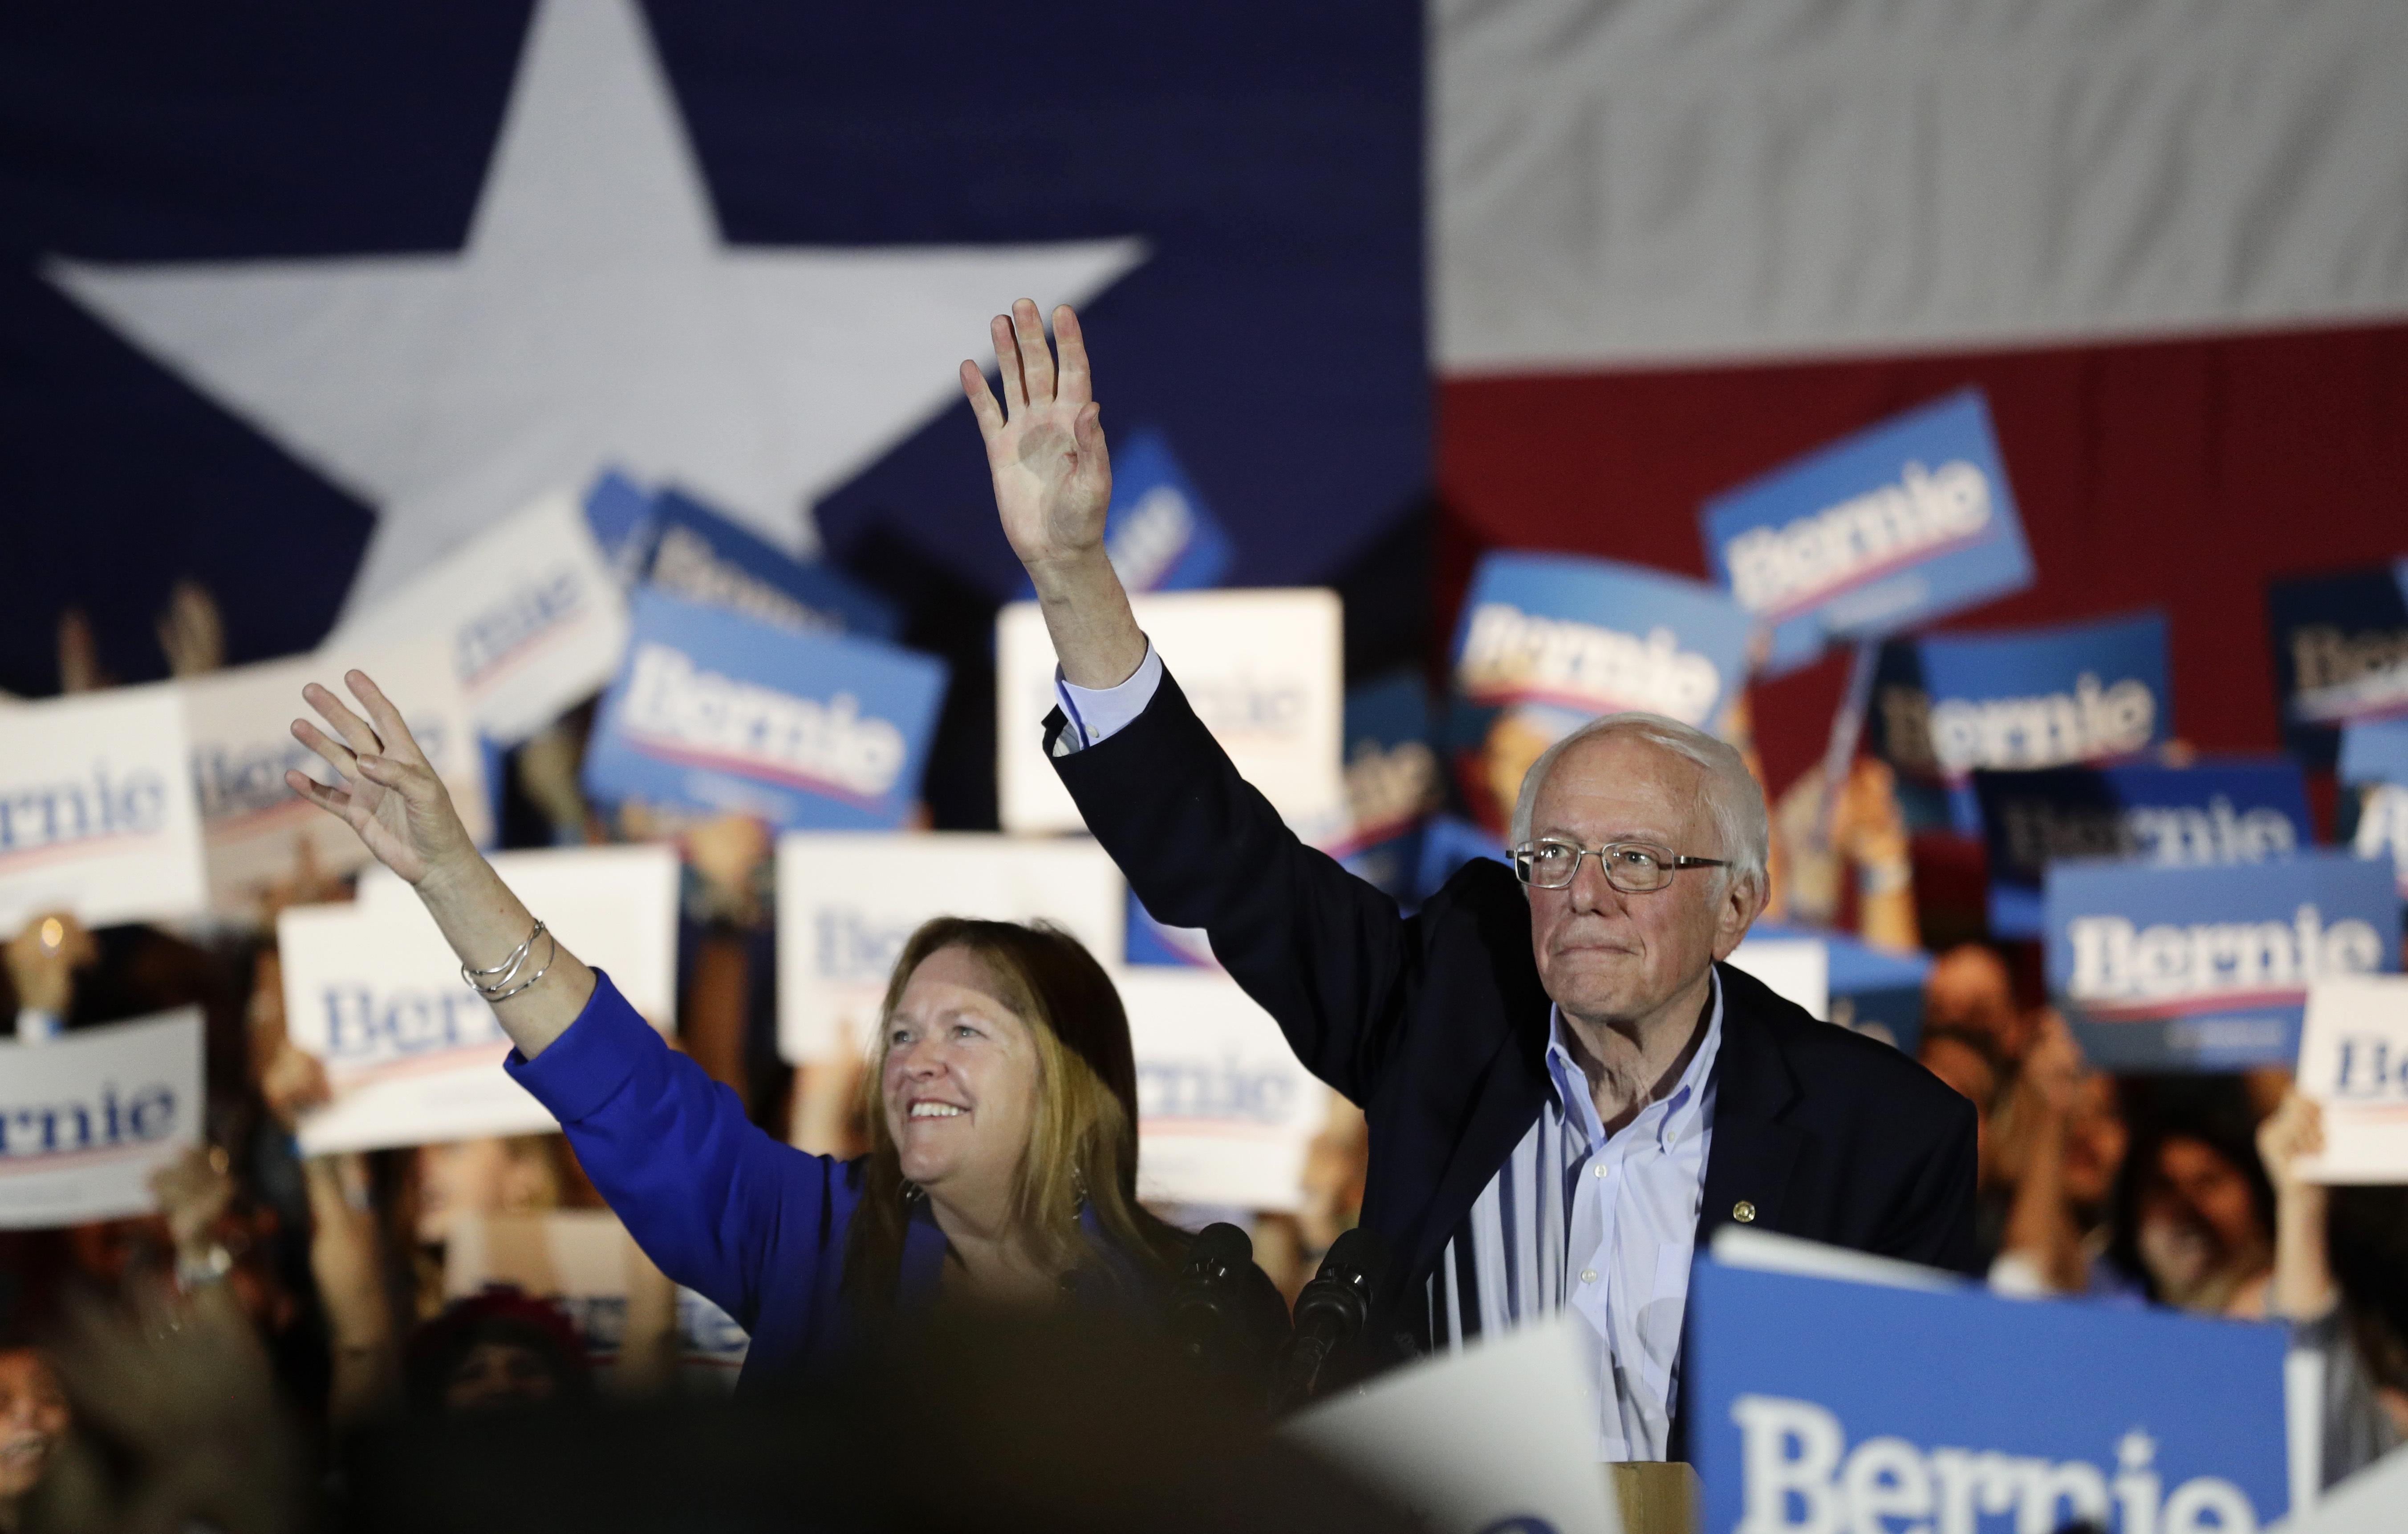 Too liberal? Bernie Sanders is cruising toward Democratic bid